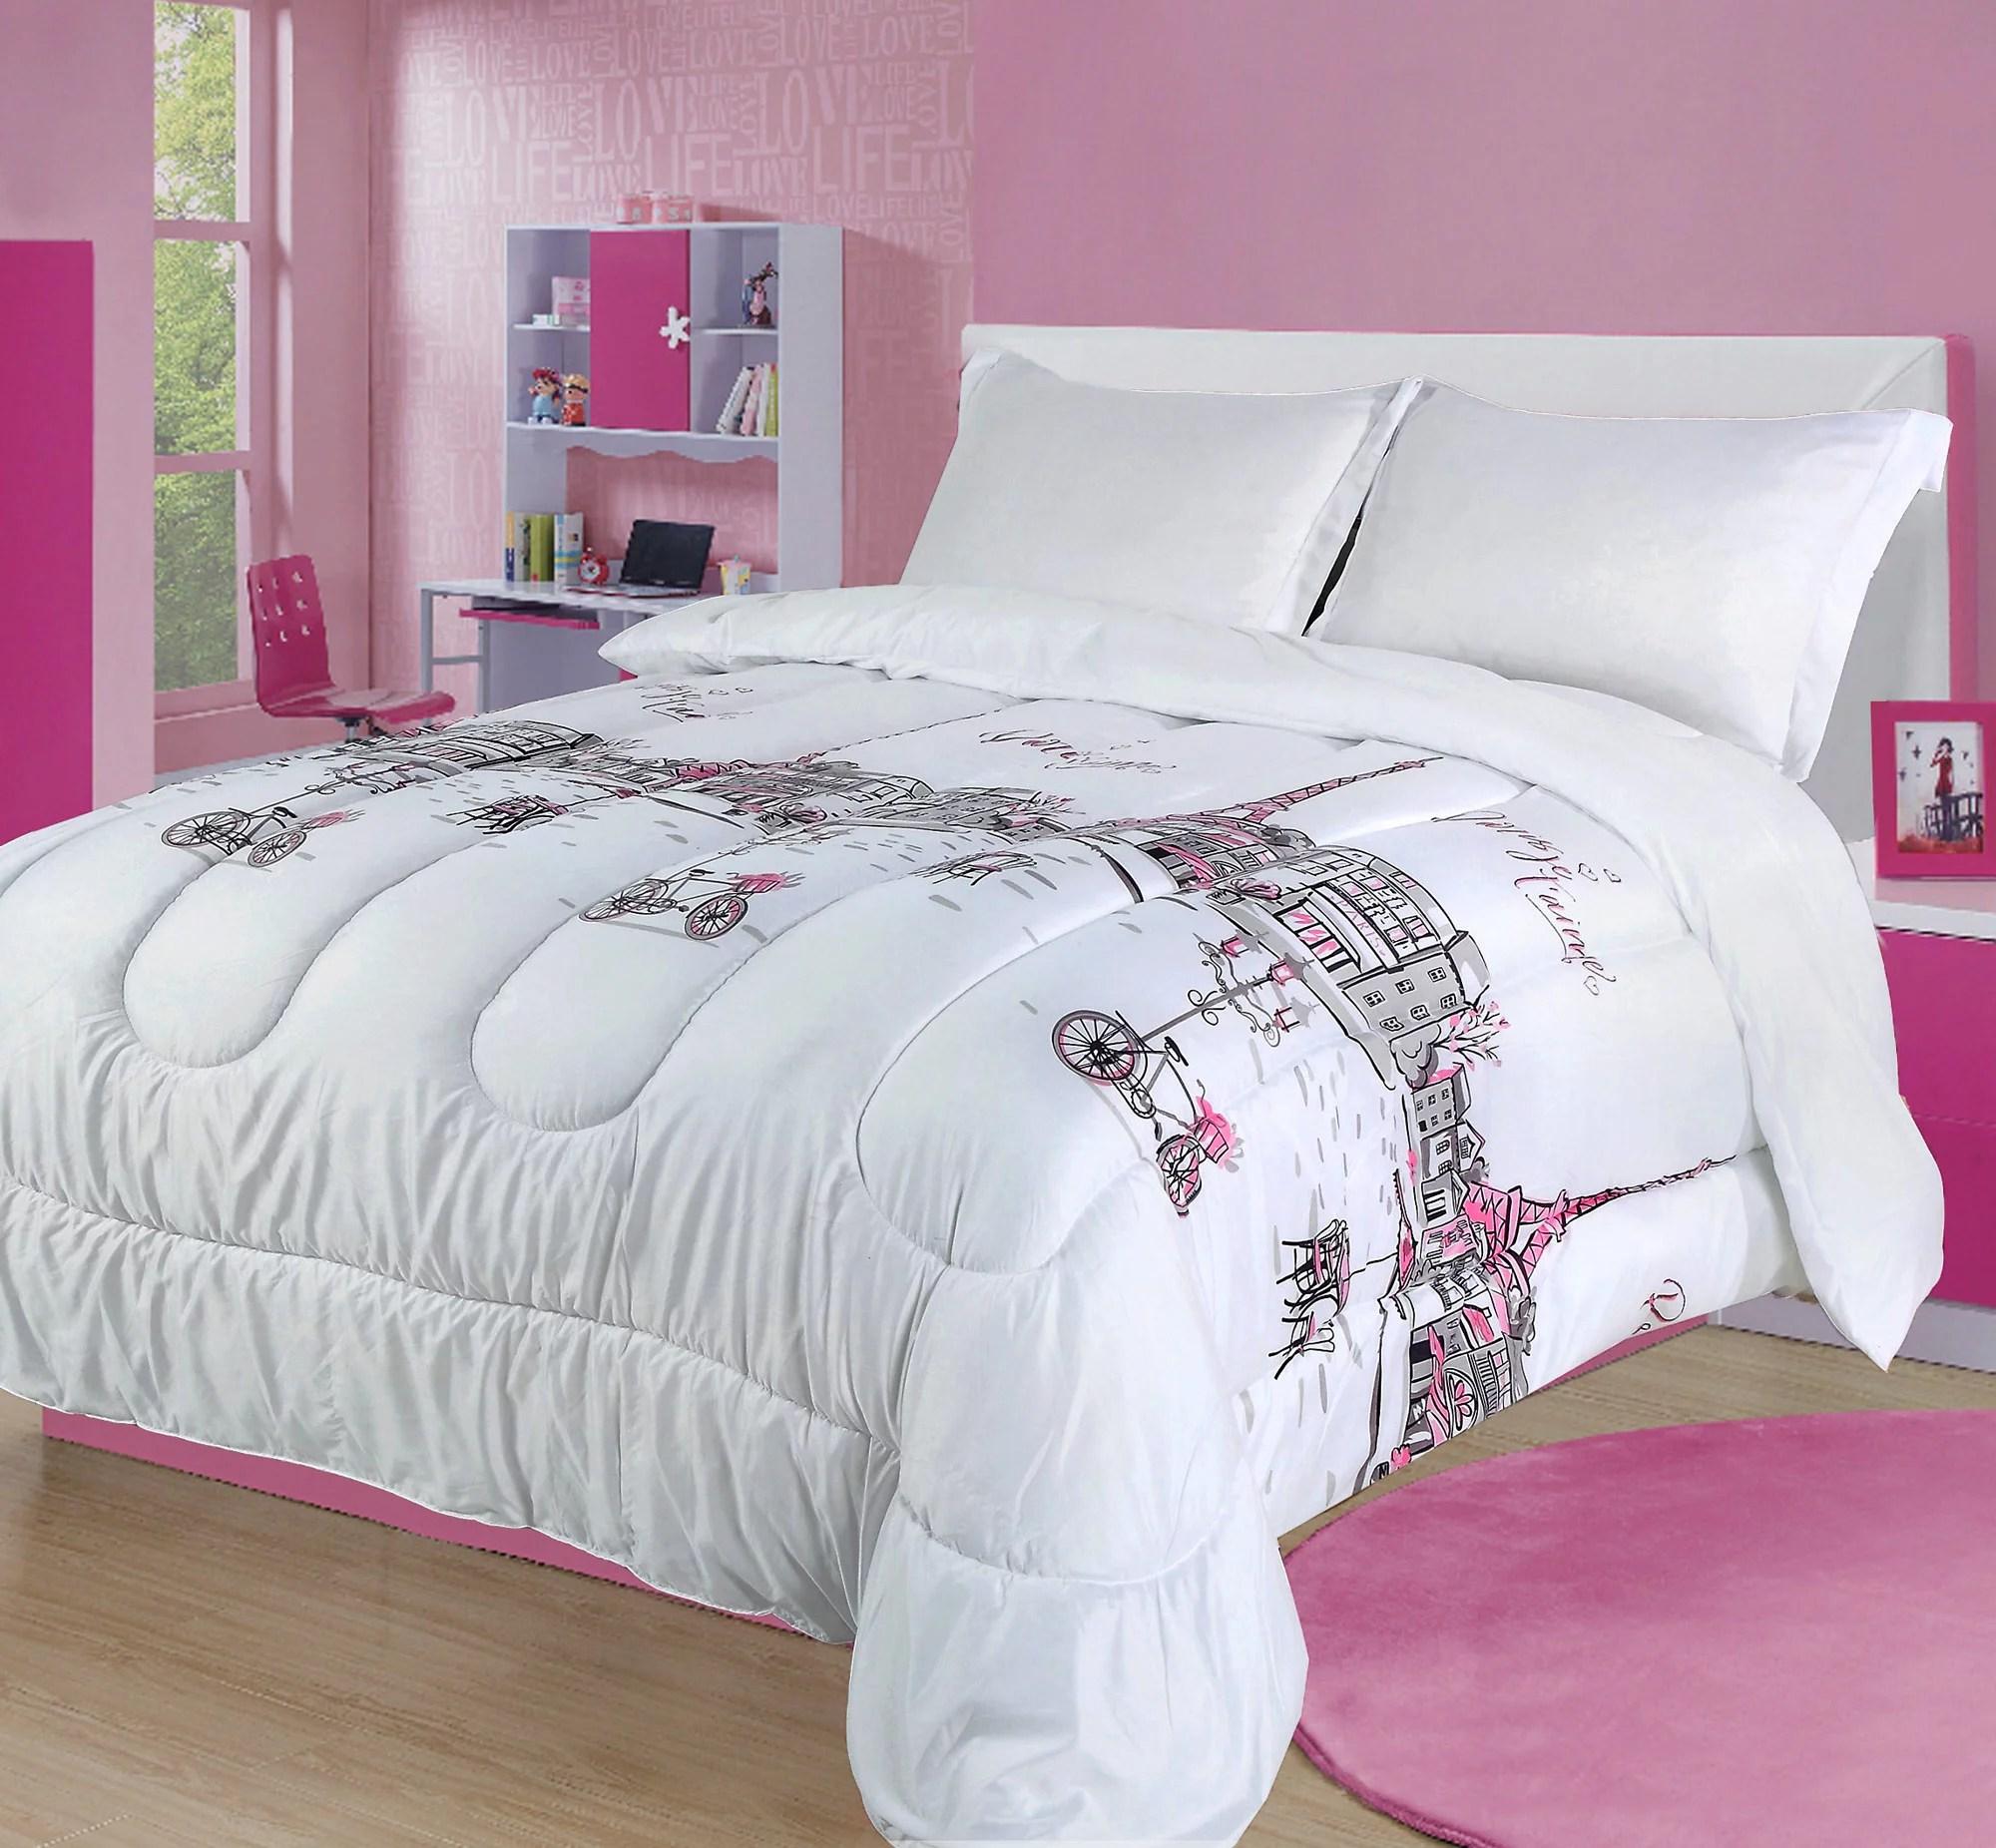 full queen paris comforter bedding set france pink white grey eiffel tower